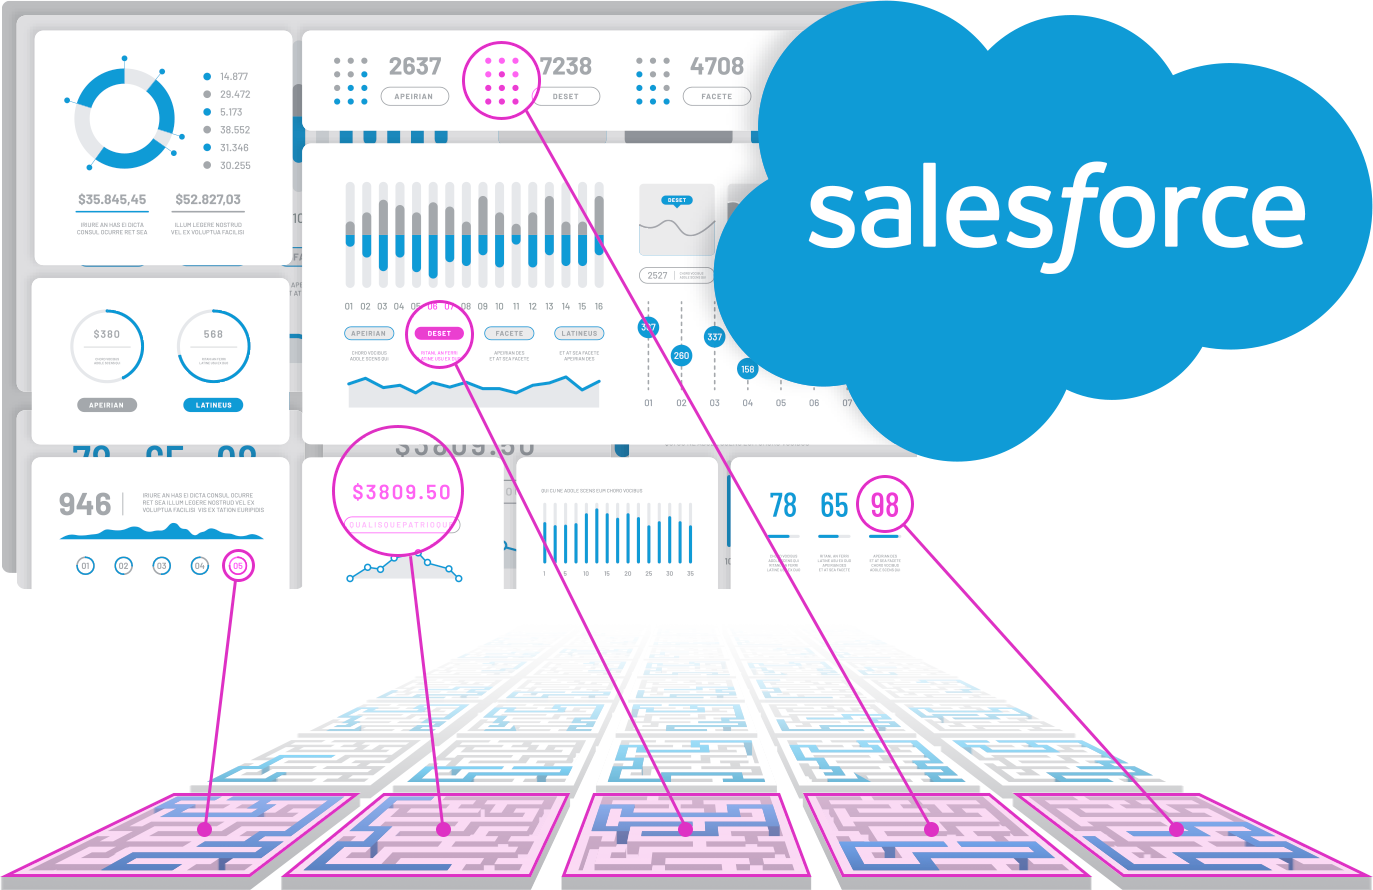 image-salesforce-25MAR2021